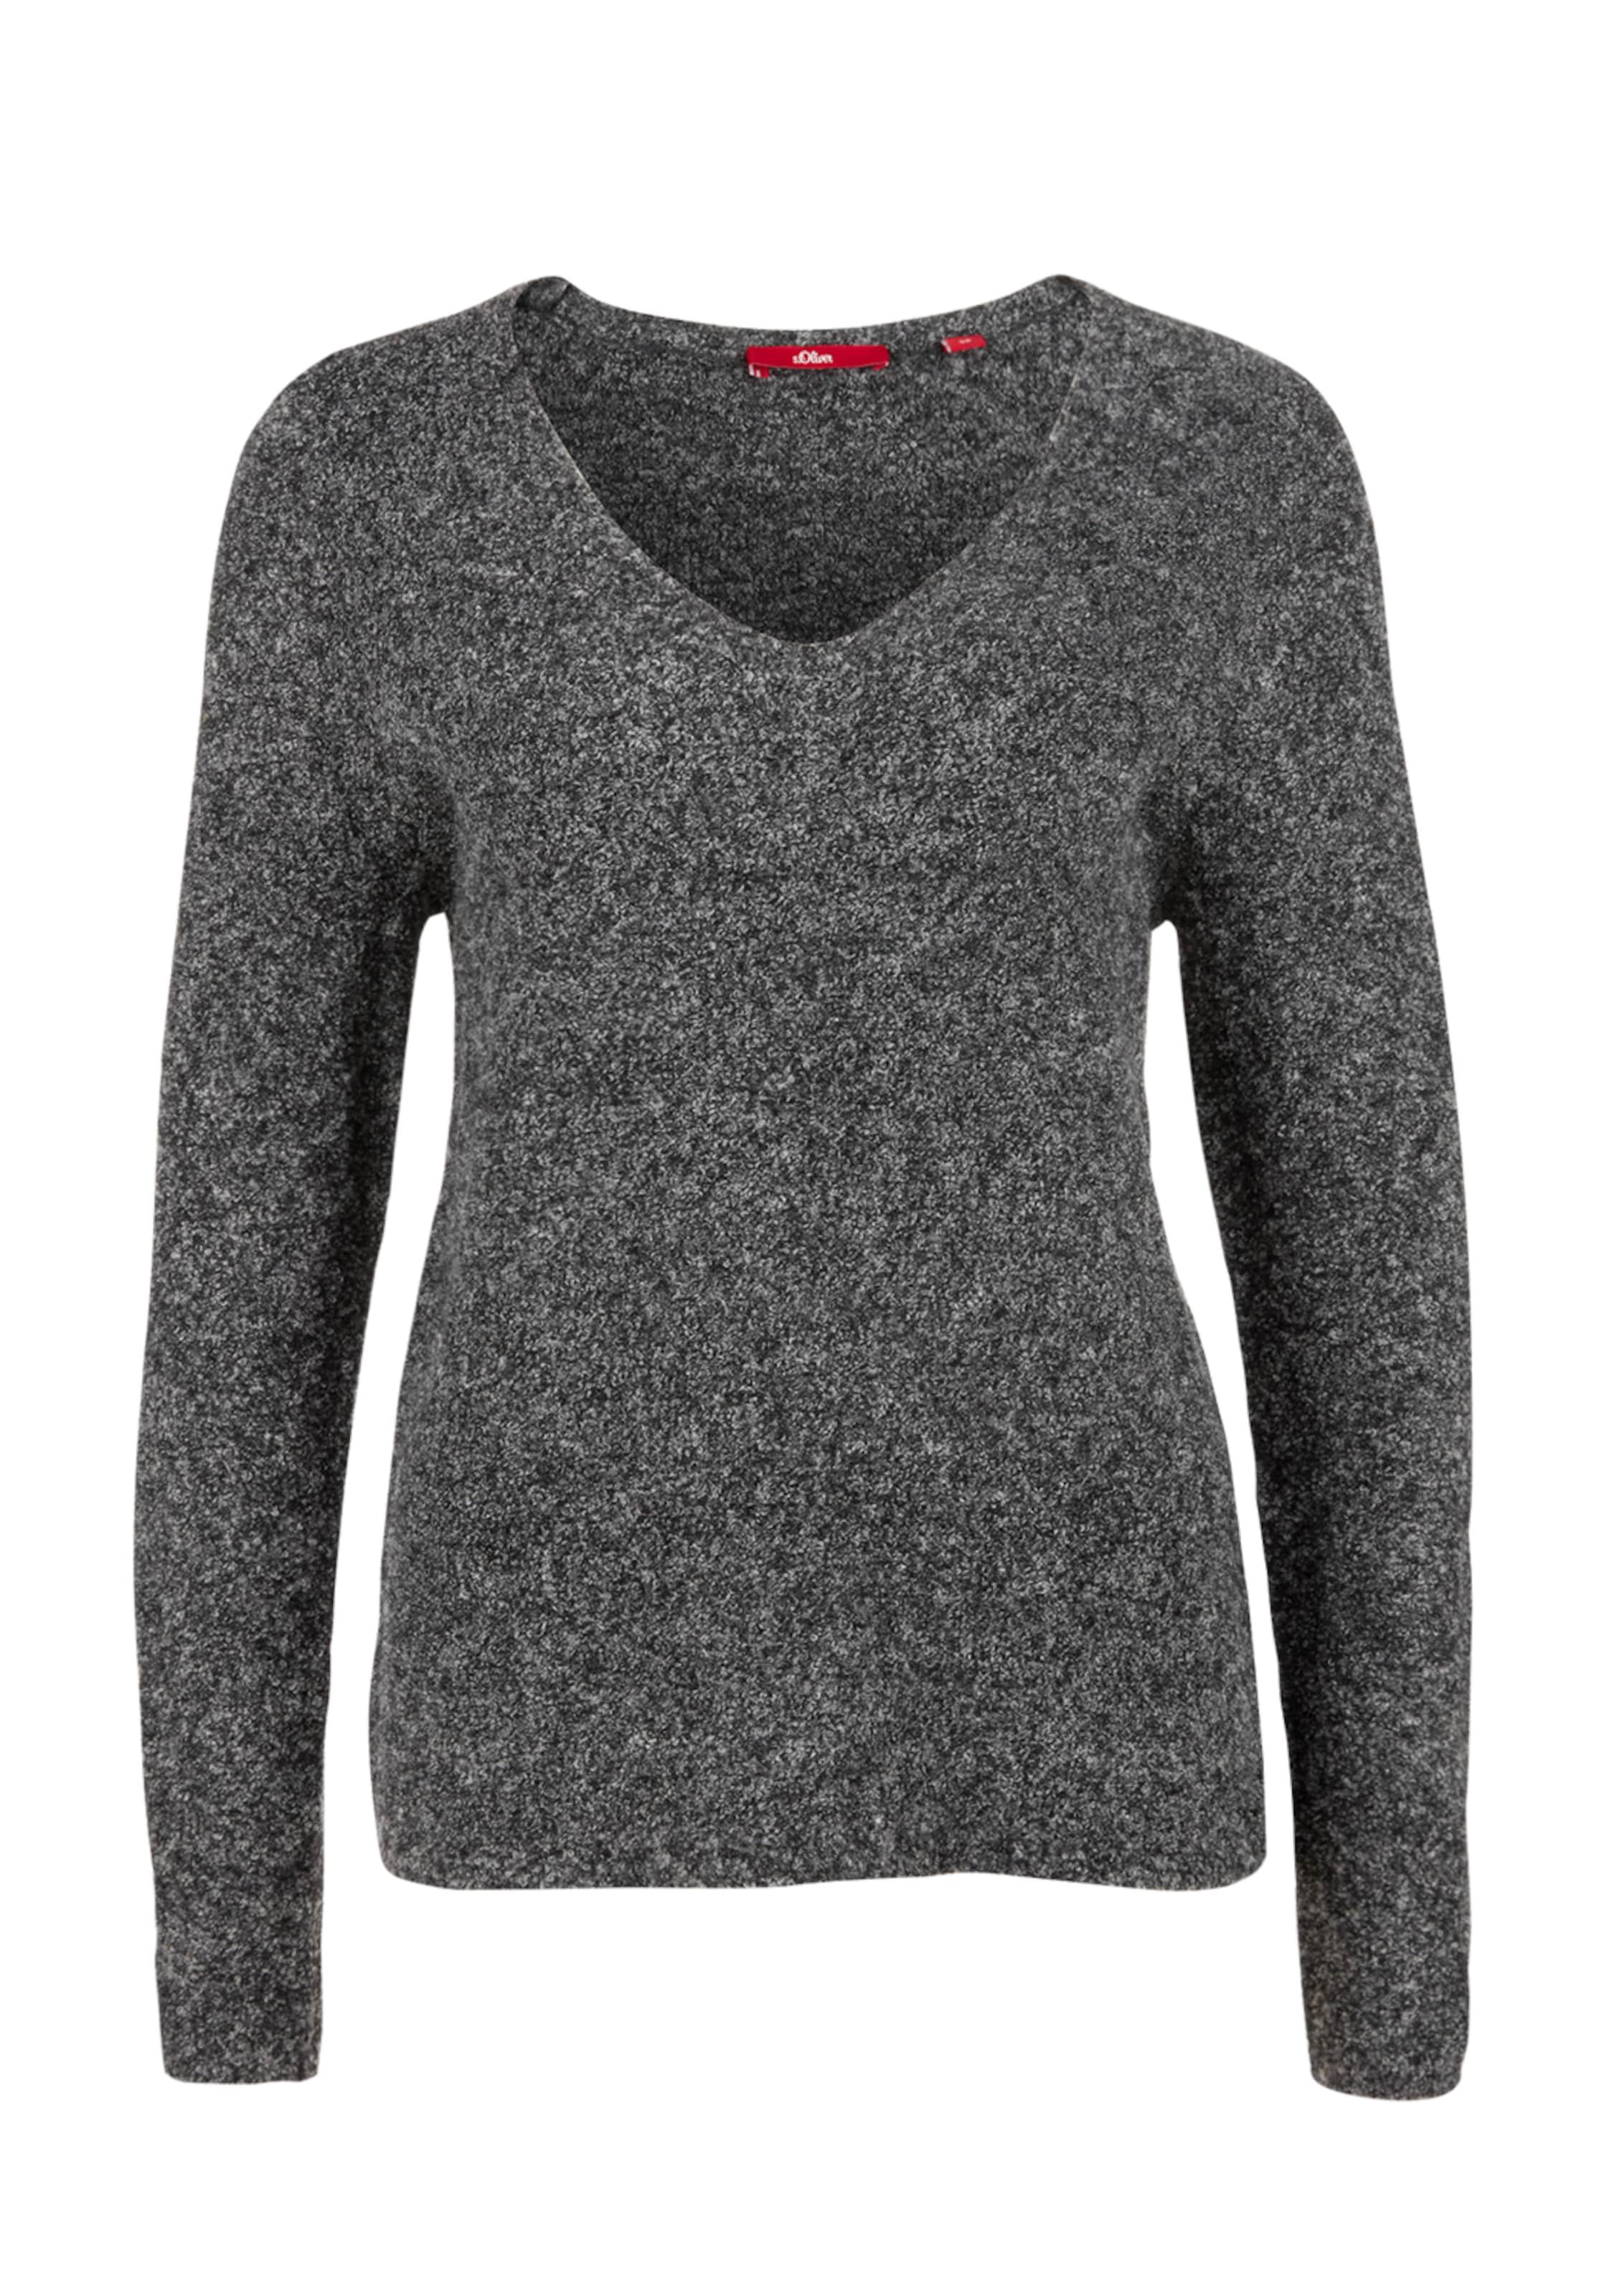 S In oliver Red Label Pullover Schwarzmeliert rCBeQdxoW